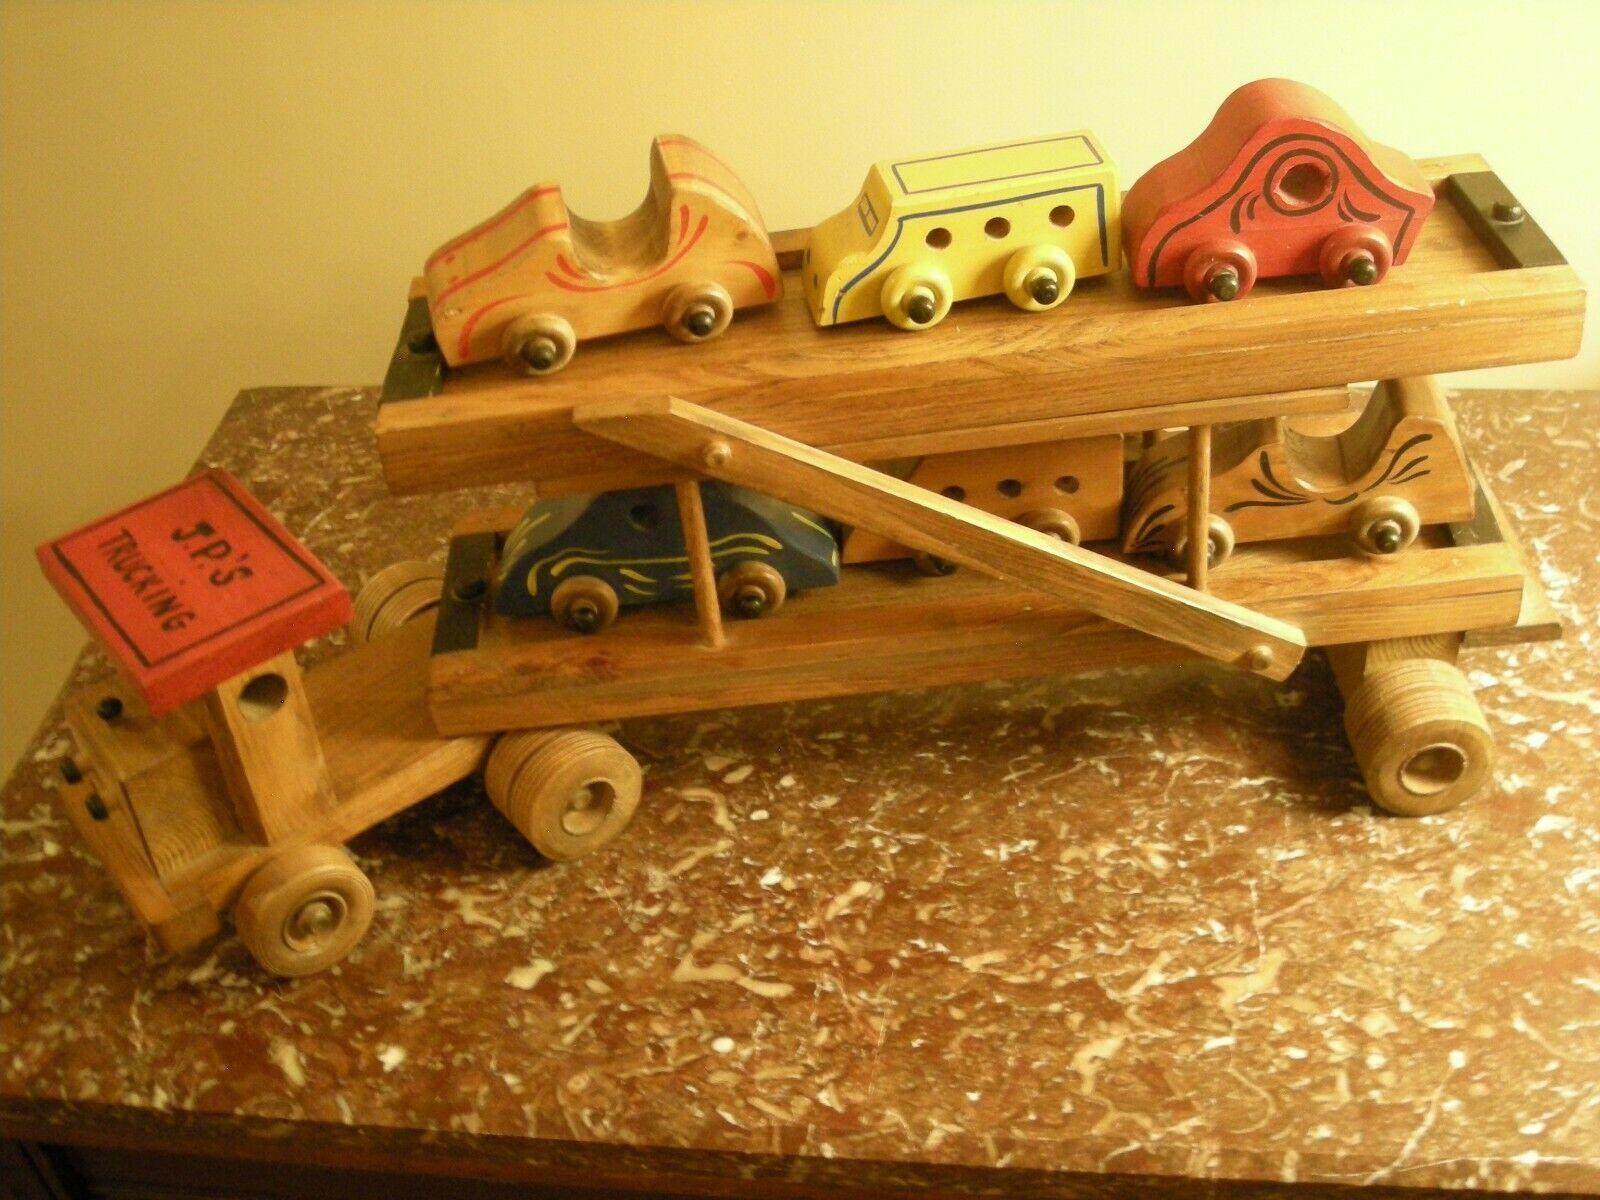 Carro Juguete Hecho a Mano Vintage De Madera Portador de superficie plana con seis coches hecho a medida